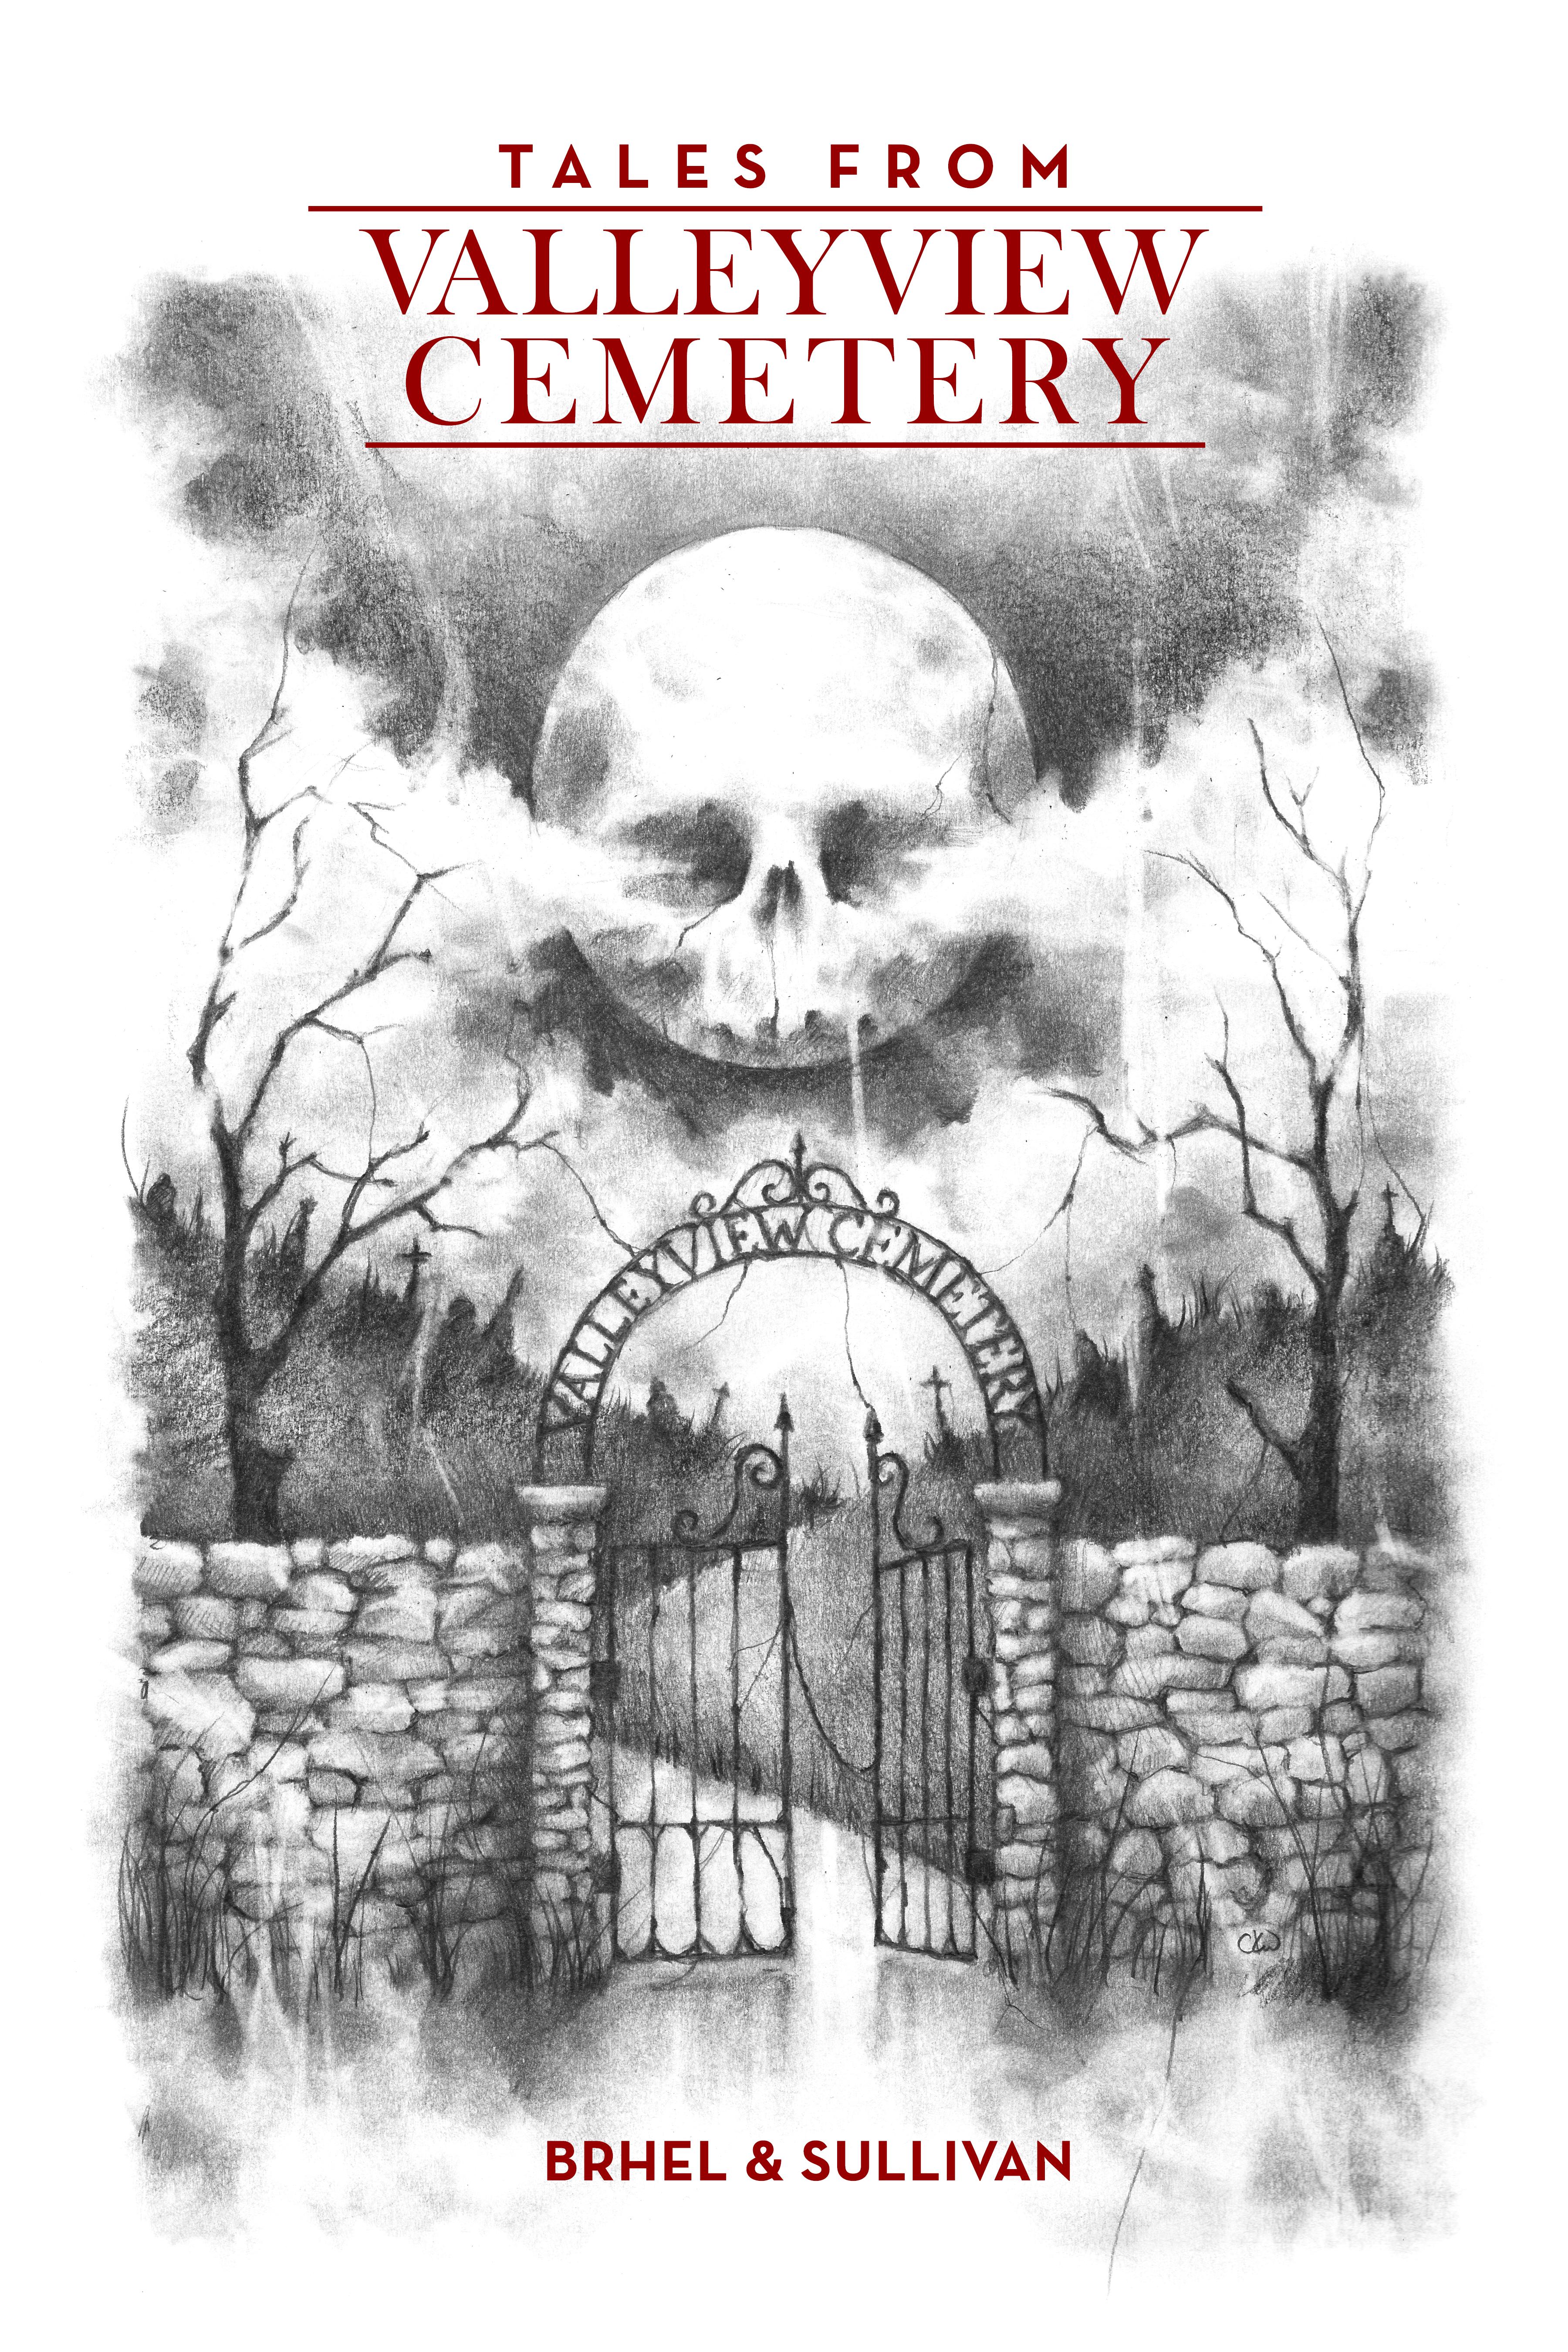 ValleyviewCemetery_Final_Cover